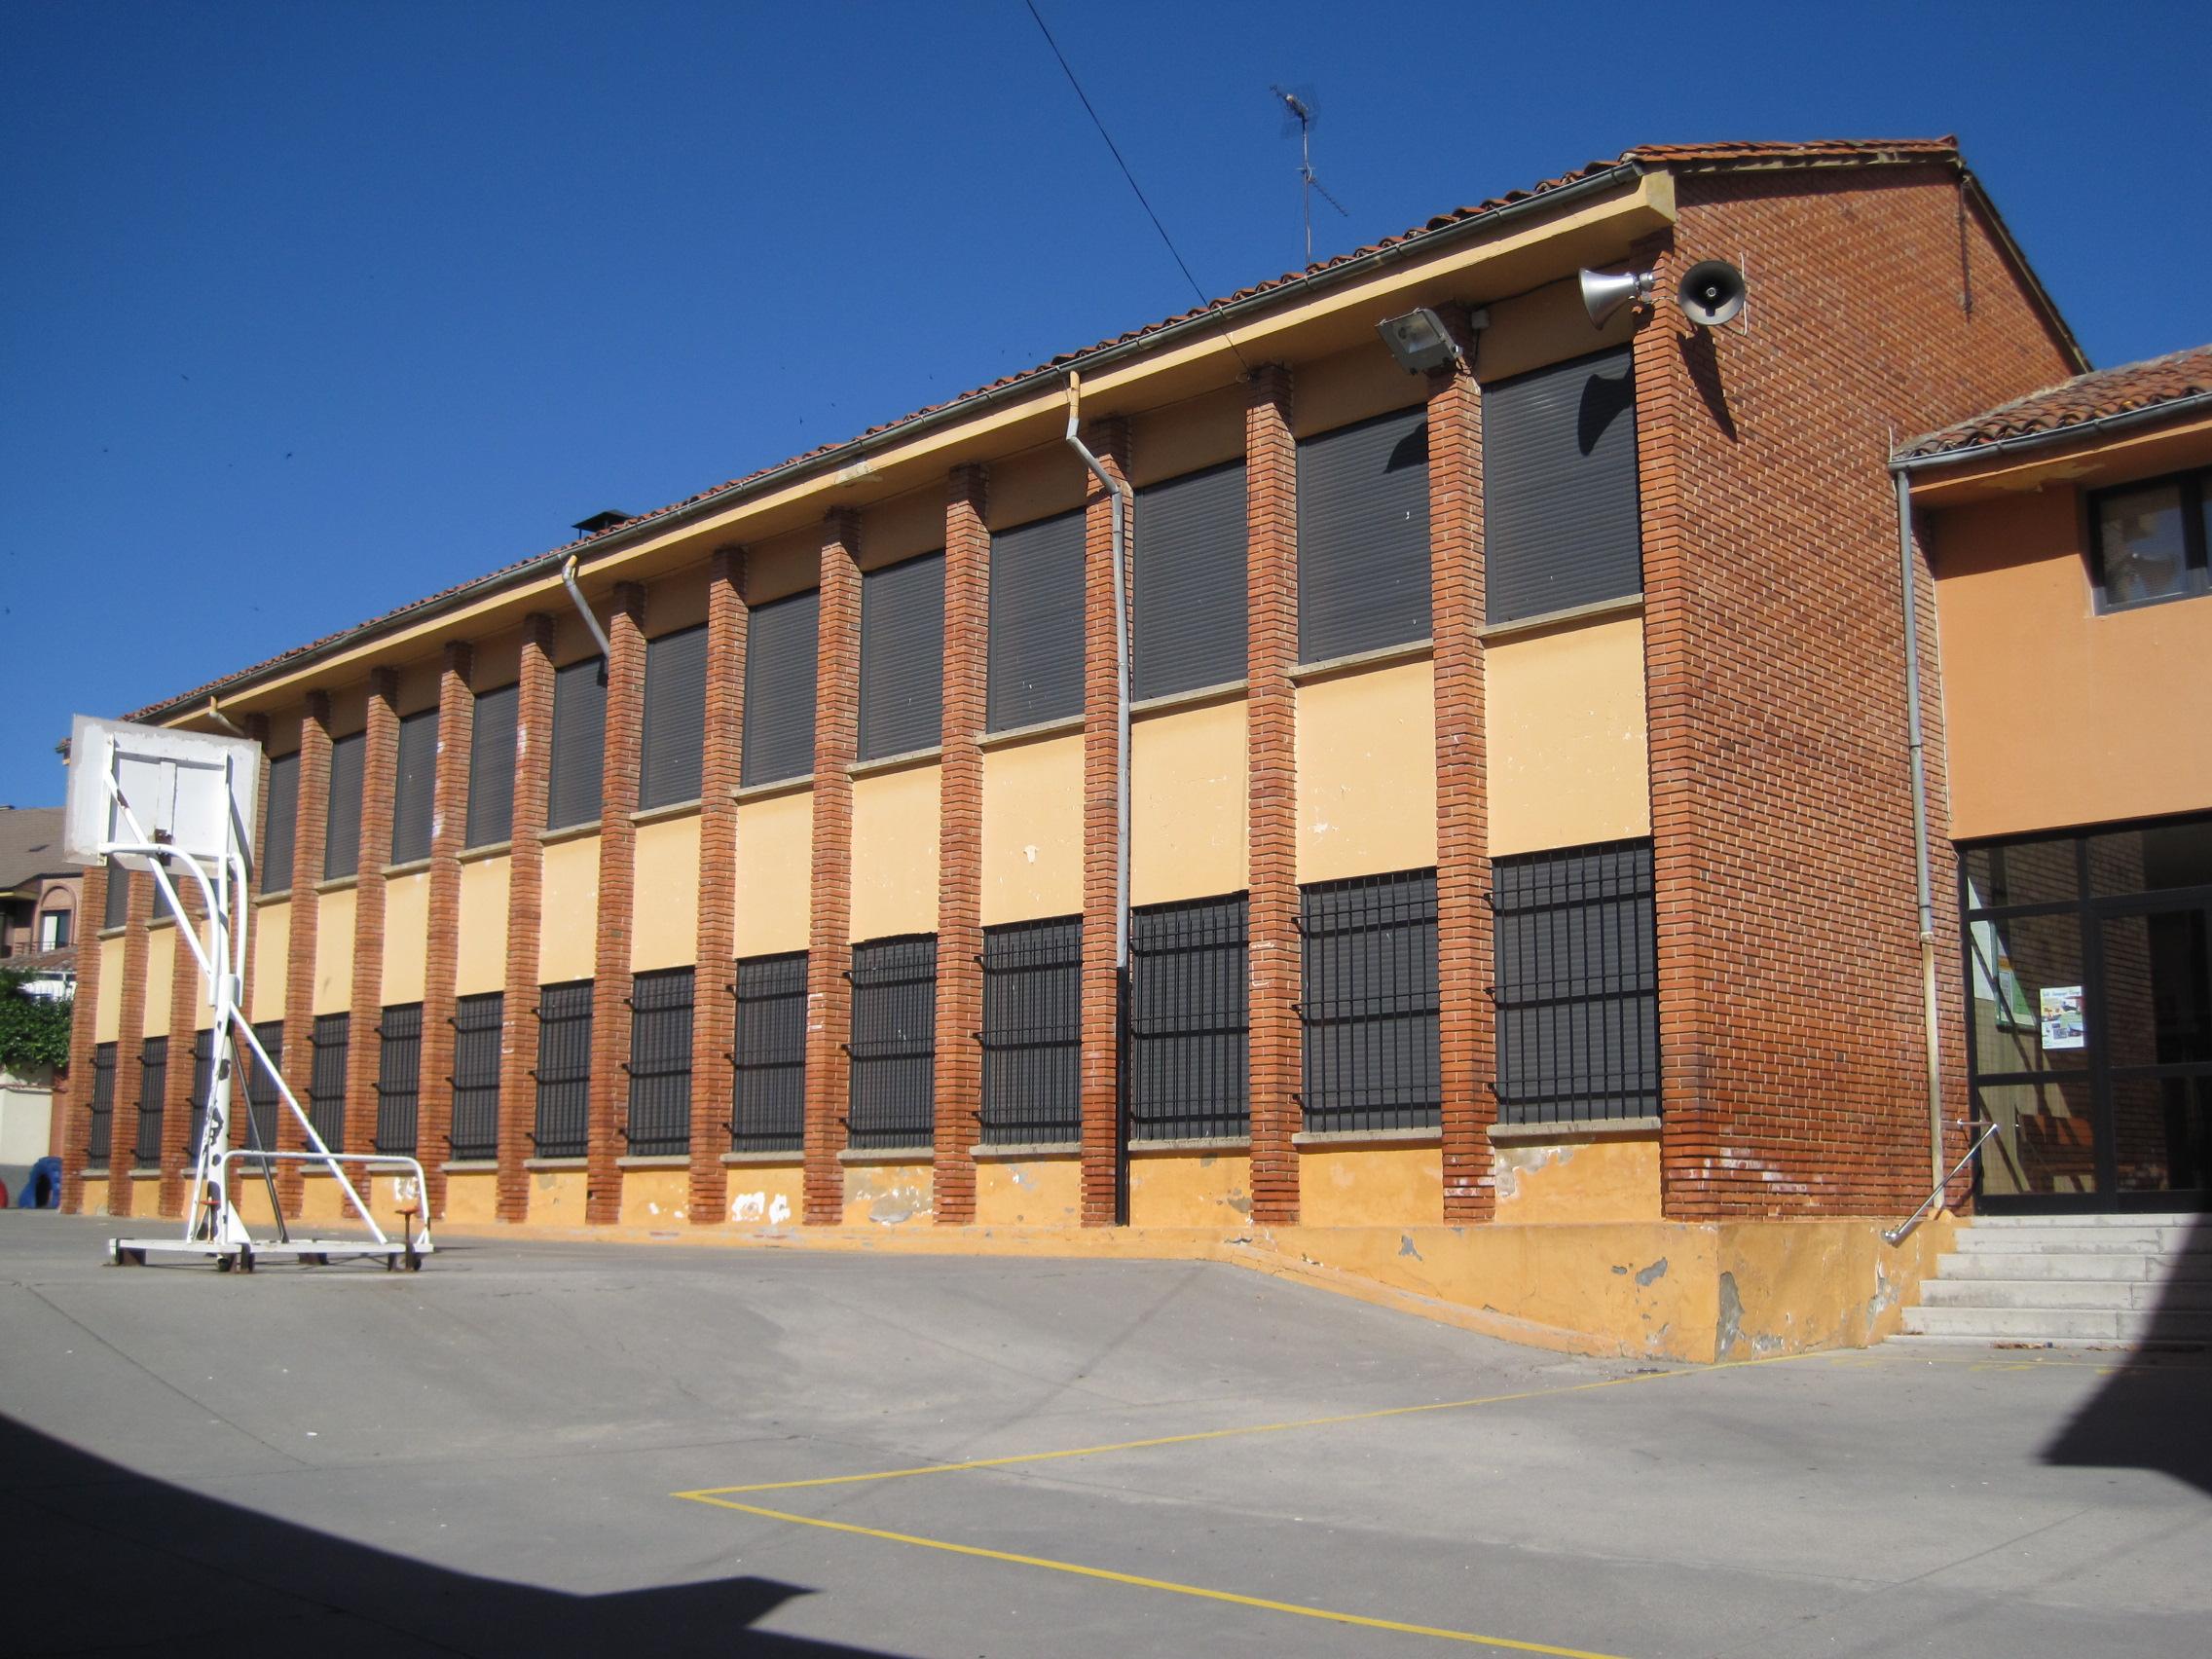 File:Colegio Santa Marta.jpg - Wikimedia Commons